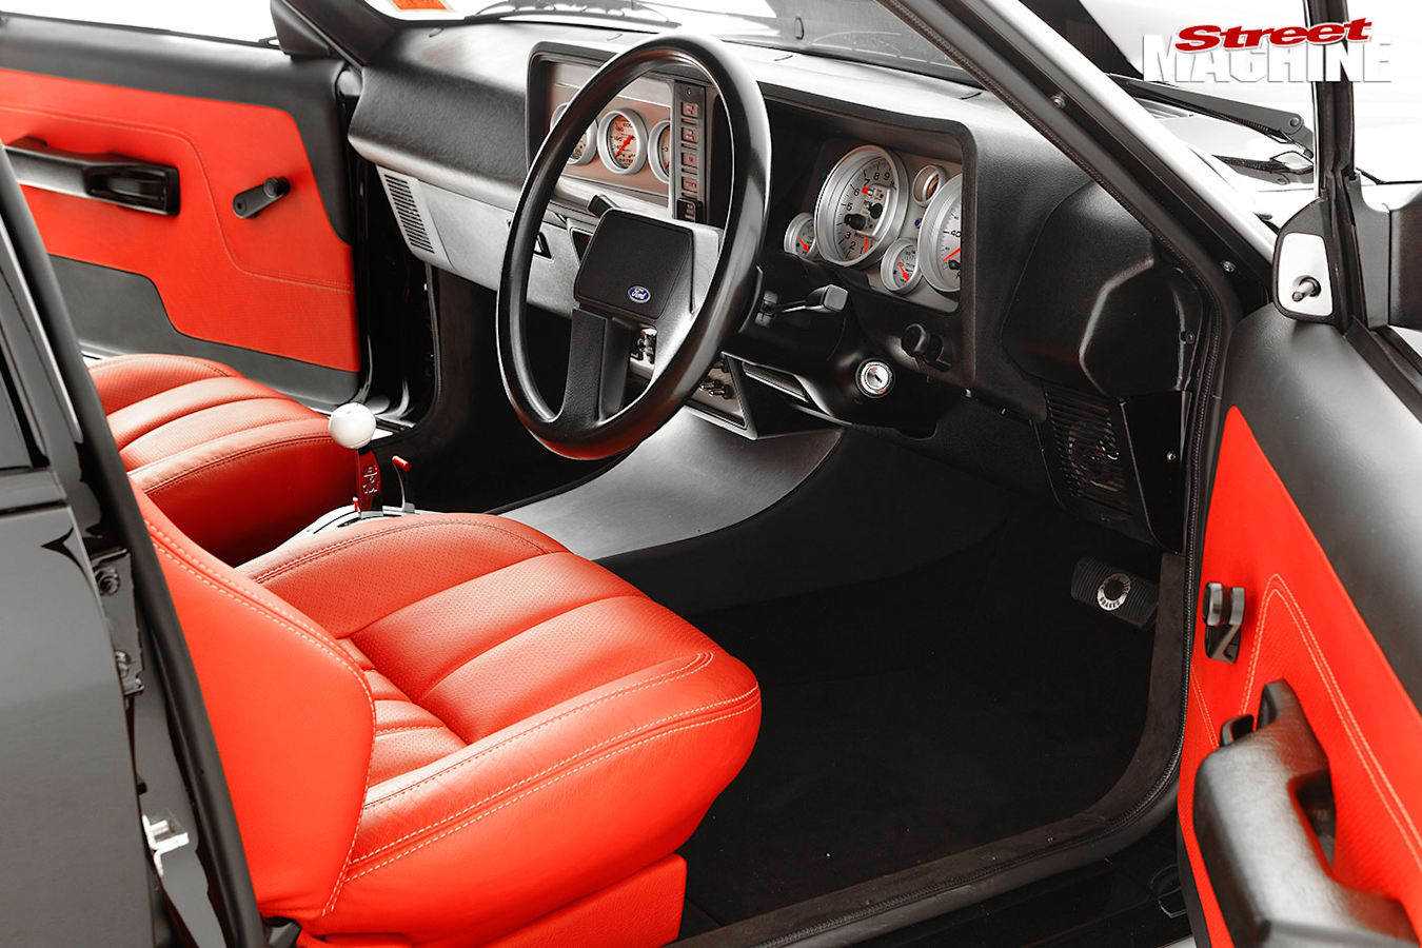 Ford XD Falcon interior front